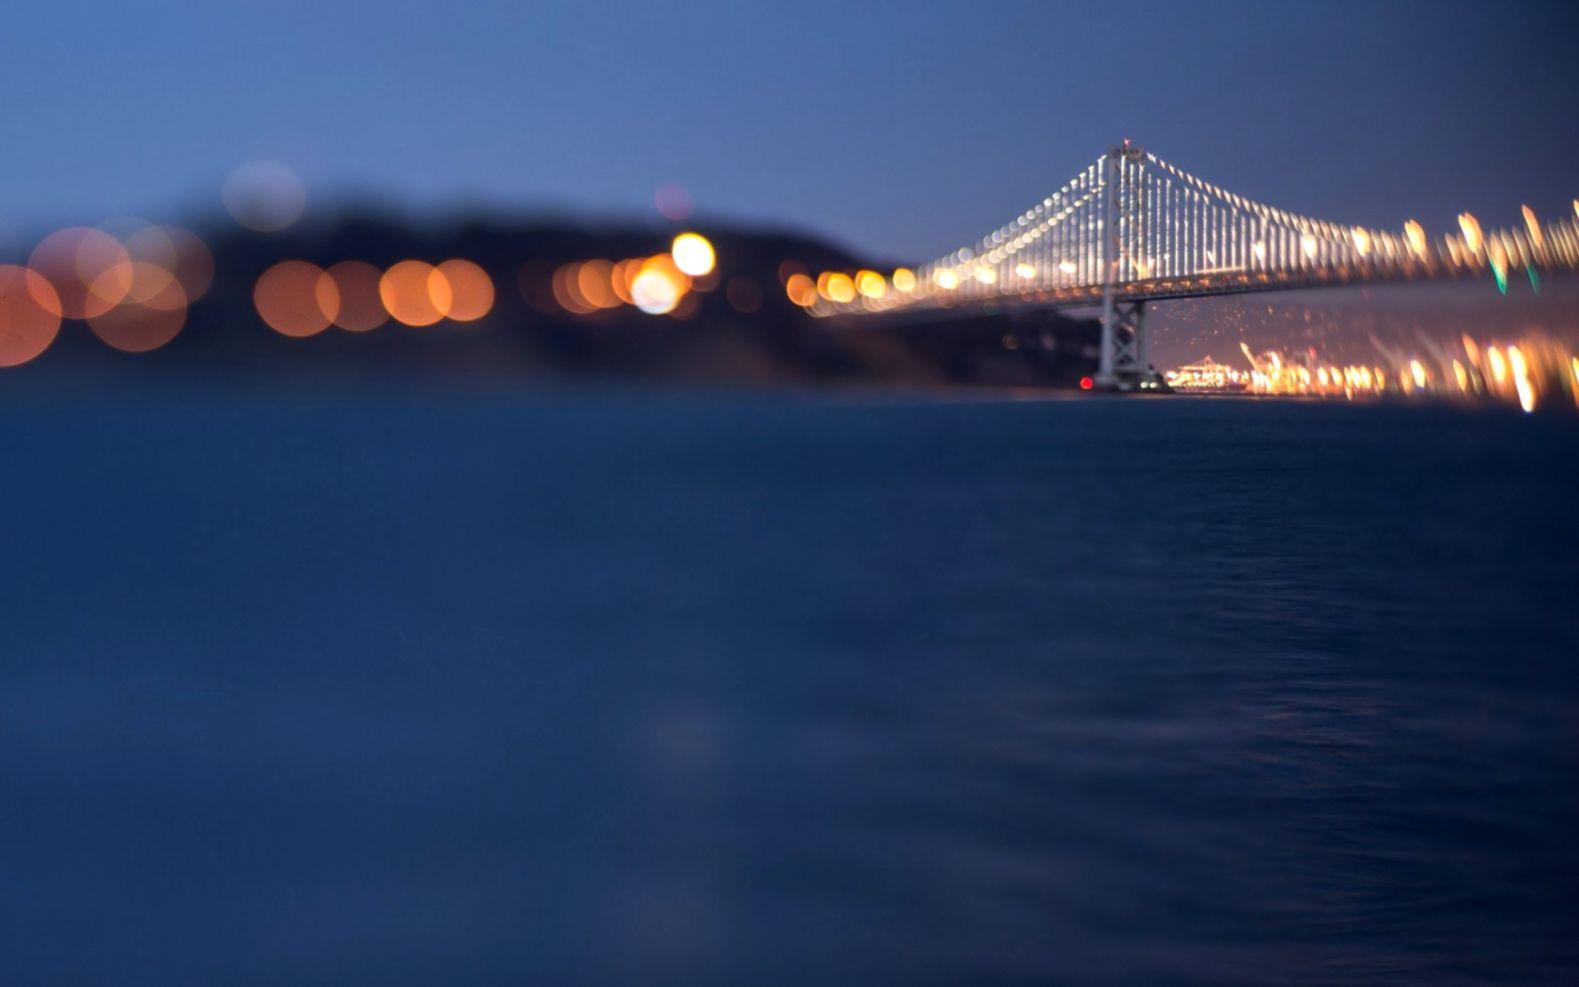 Bridge Bokeh Lights Hd Wallpaper Like Wallpapers